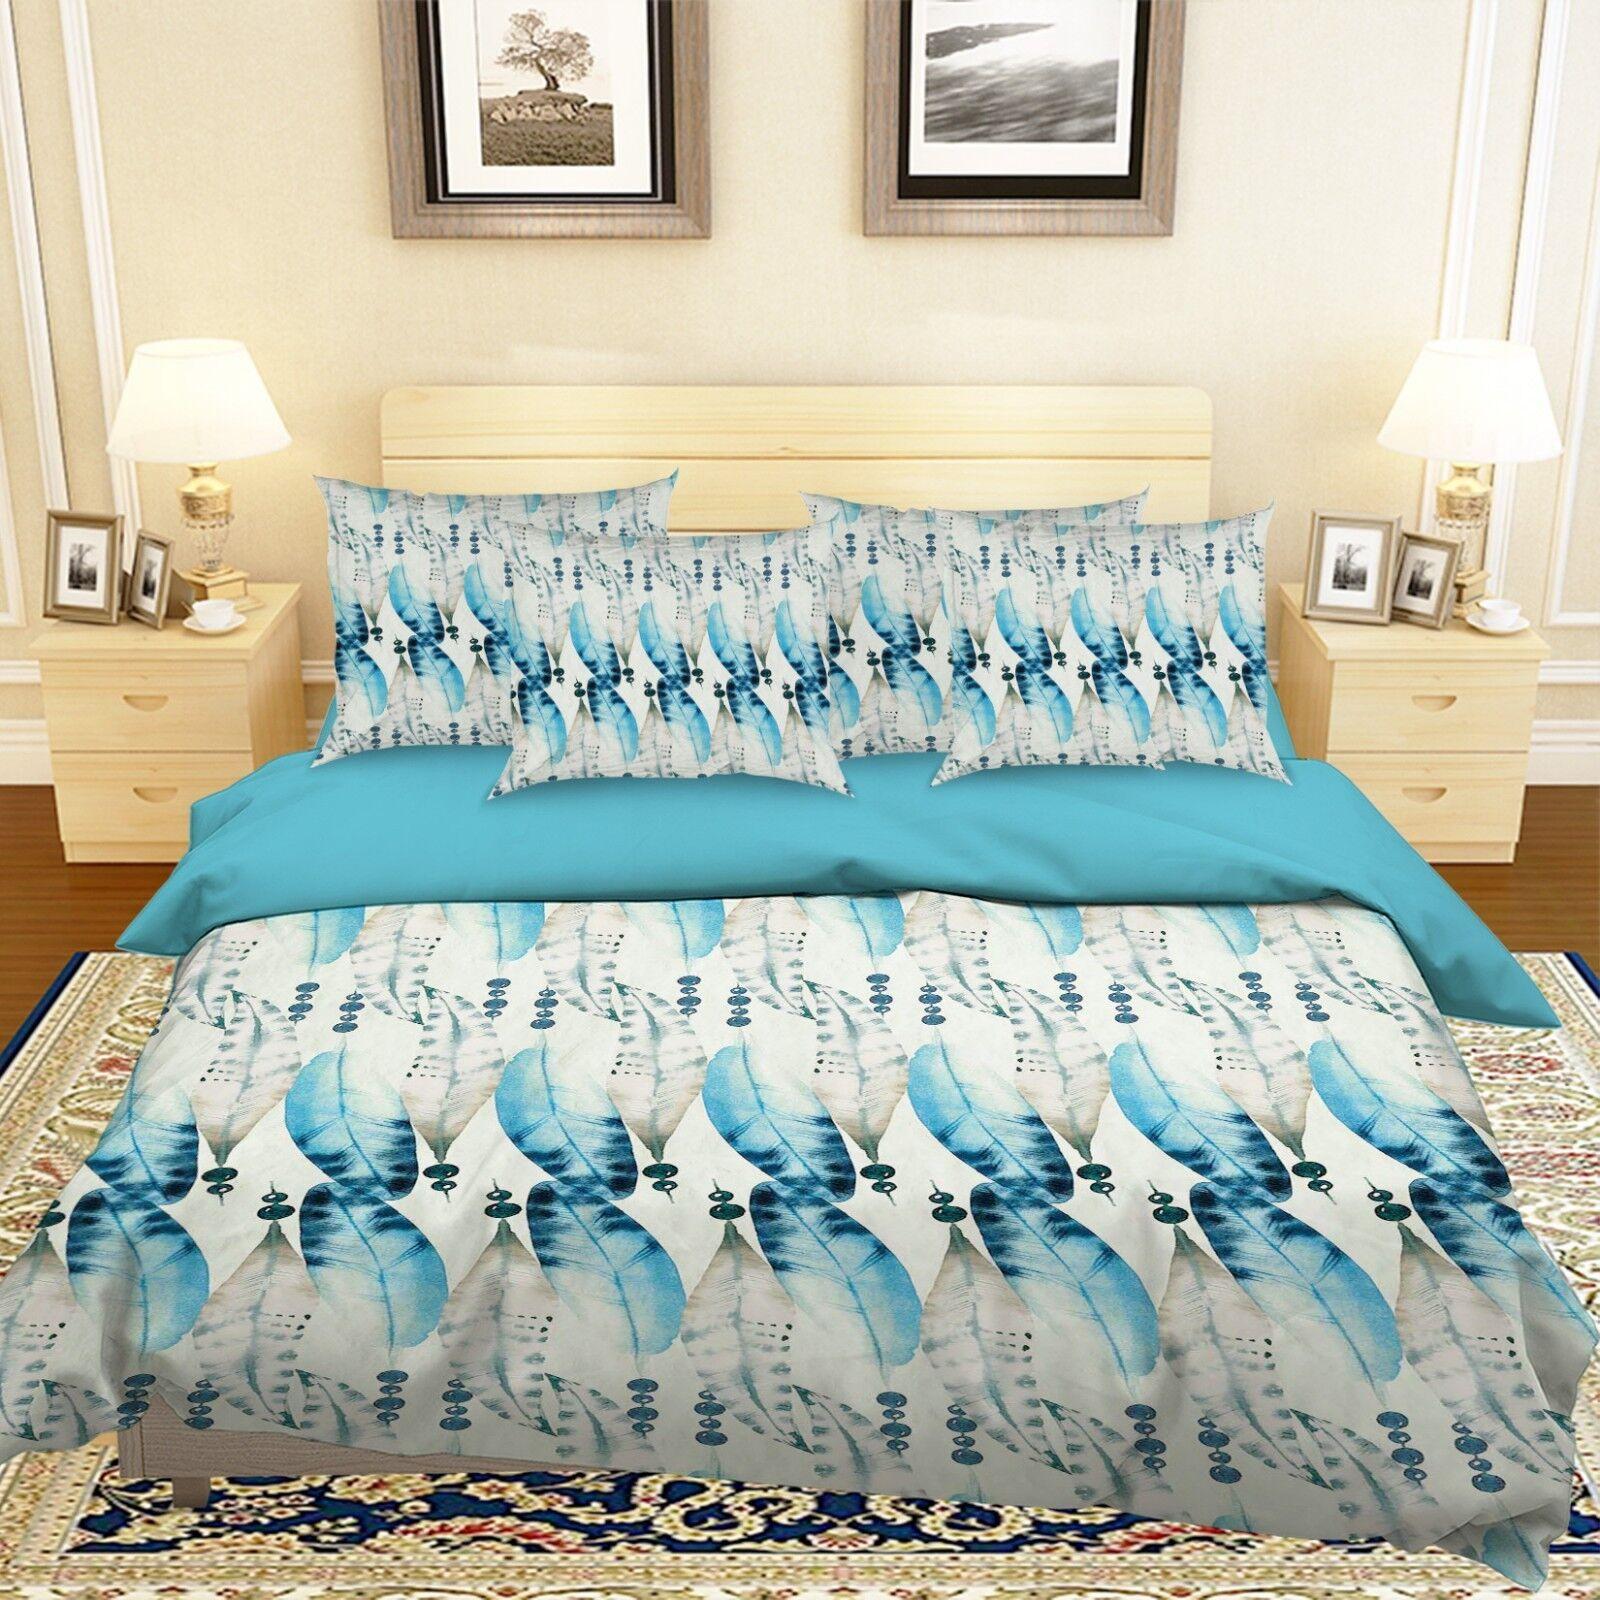 3D Blau Feather 685 Bed Pillowcases Quilt Duvet Cover Set Single King UK Lemon